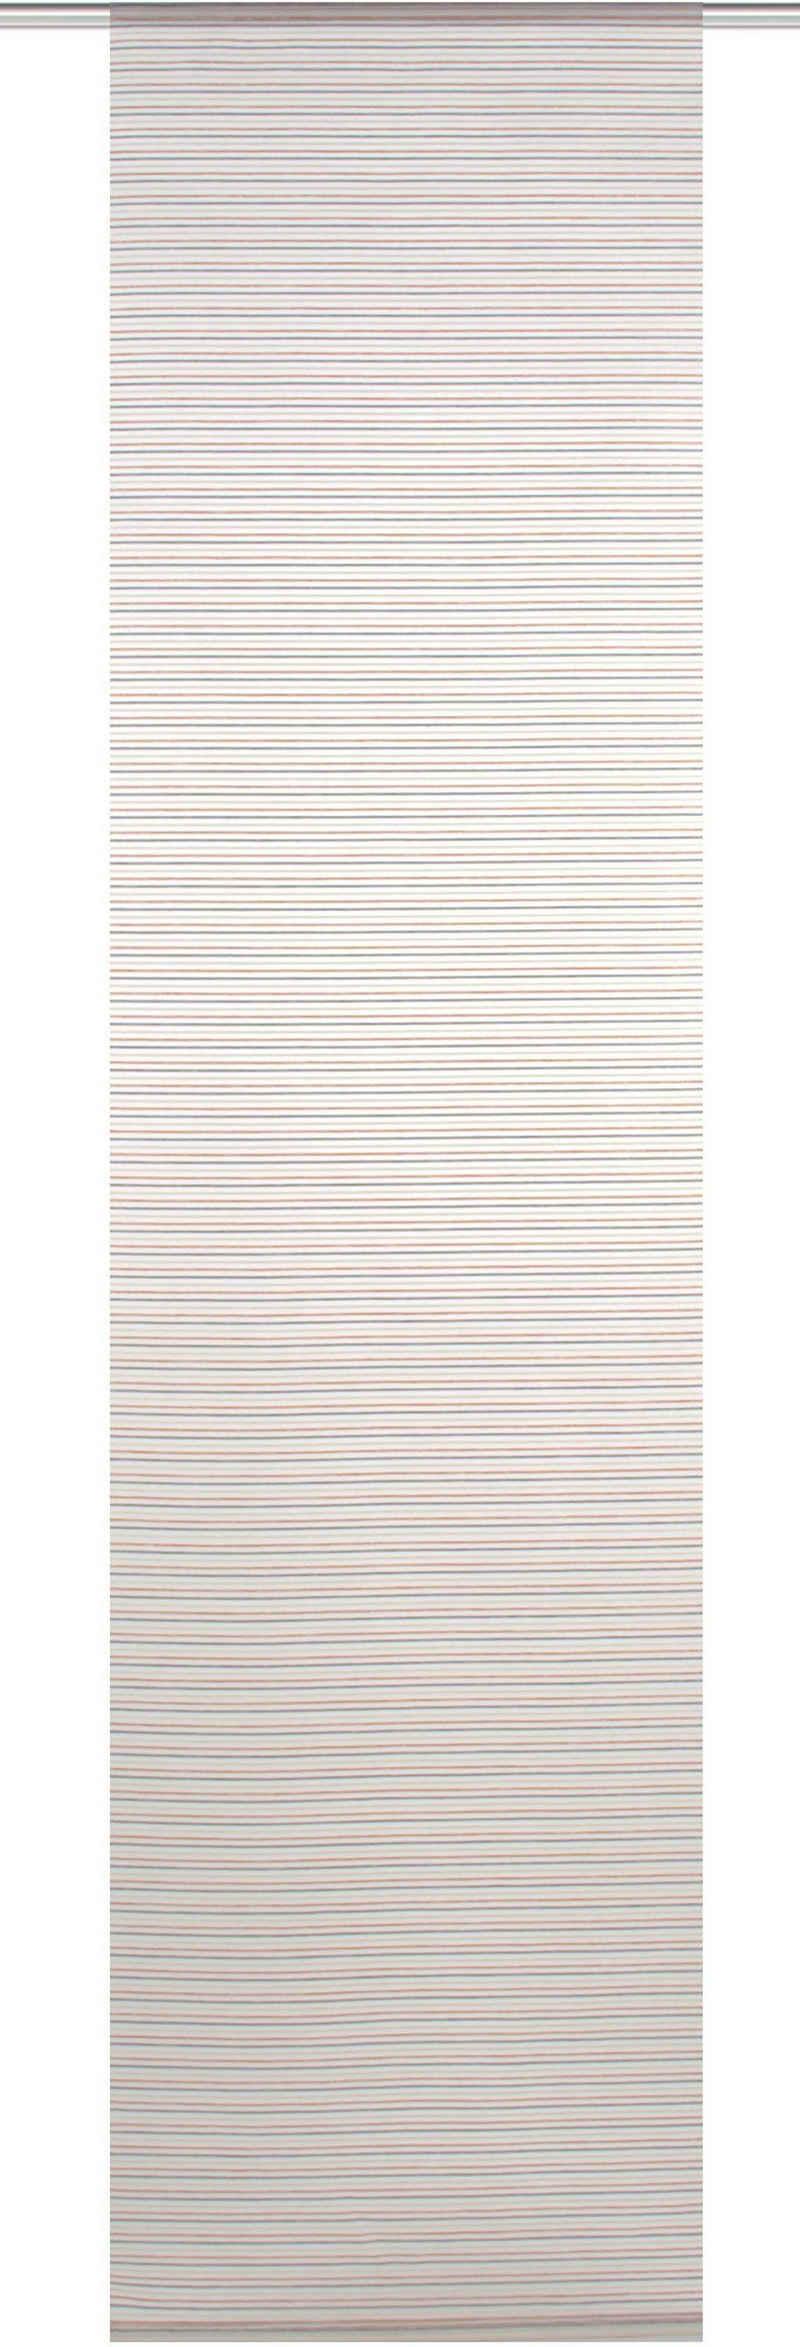 Schiebegardine »JÖRG«, HOME WOHNIDEEN, Klettband (1 Stück), HxB: 245x60, Bambus Querstreifen